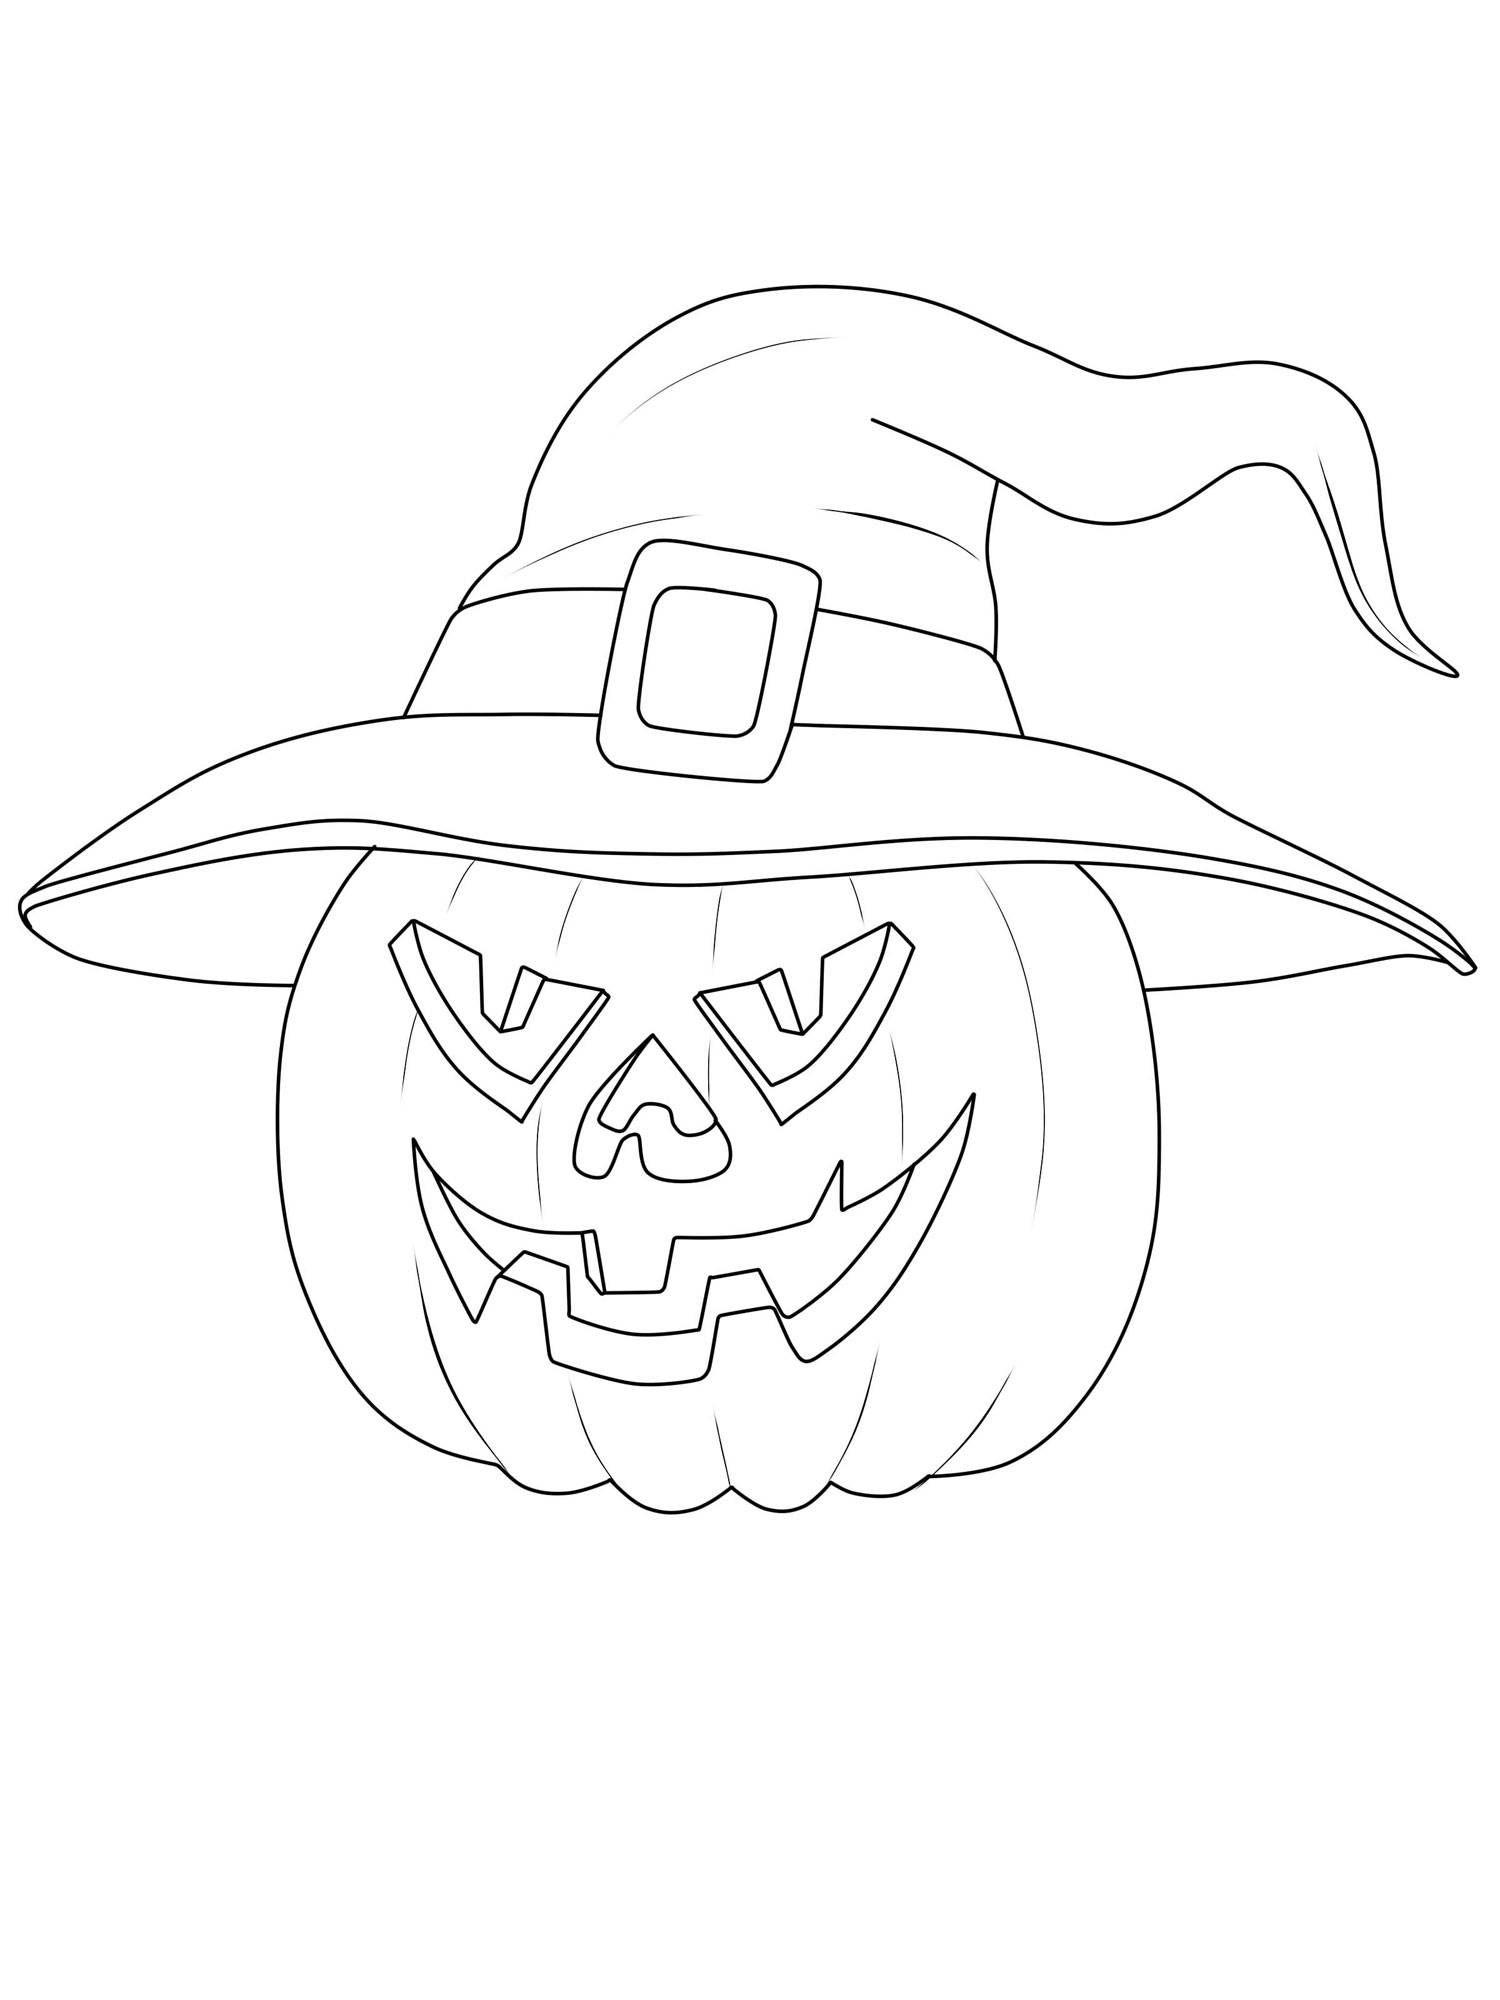 Ausmalbild Halloween: Kürbis-Hexe ausmalen kostenlos ausdrucken